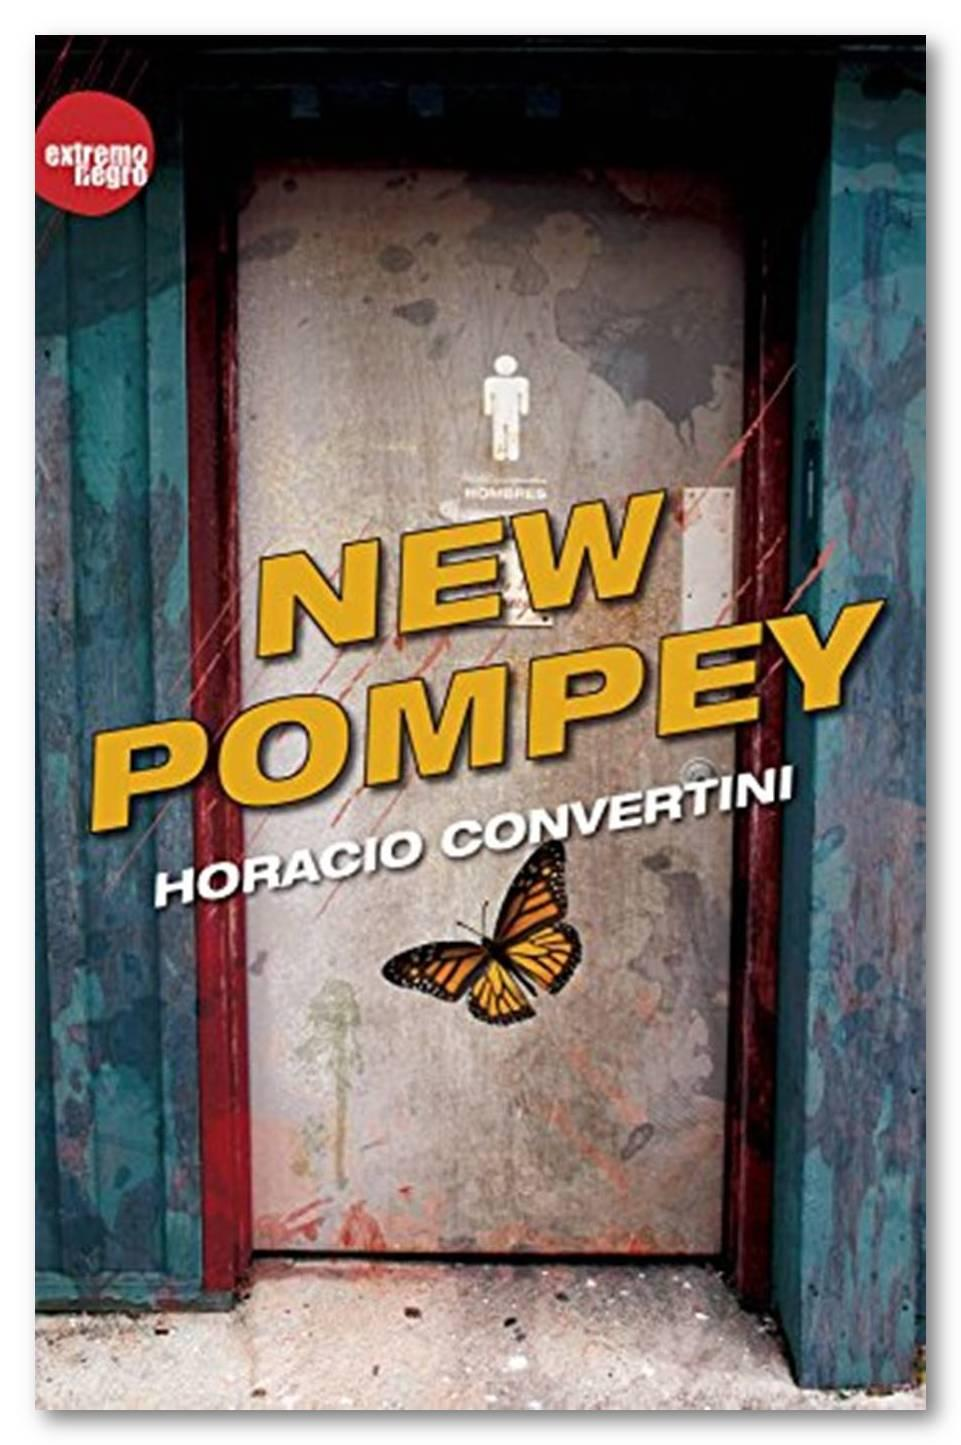 New pompey, Horacio Convertini